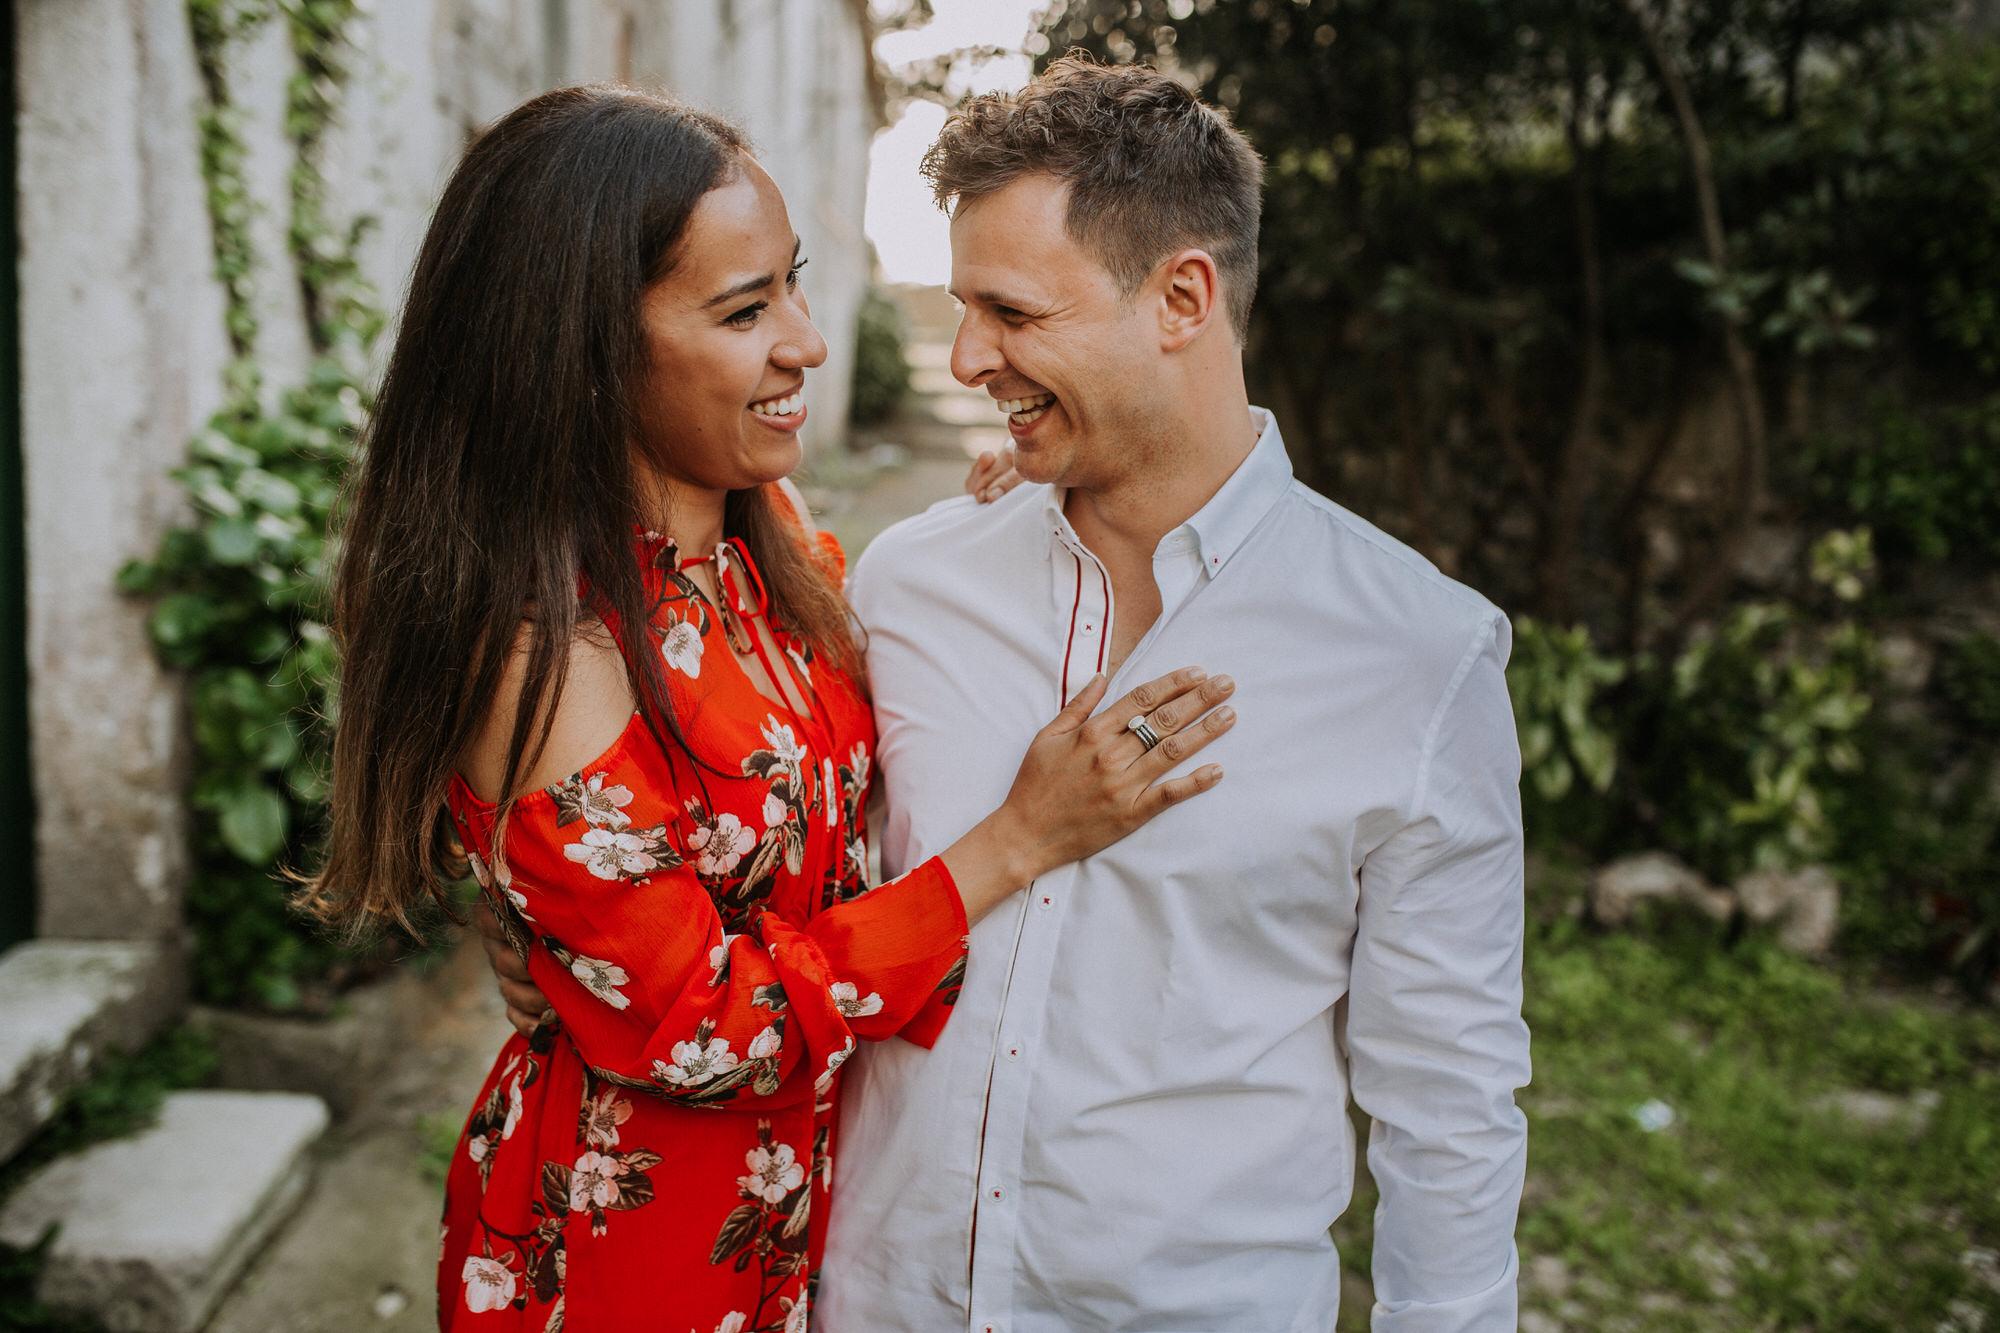 04-sessao-noivado-engagement-love-session-Sintra-lisboa-town-wedding-photography-photographer-natural-best-venue-planner-destination-filipe-santiago-fotografia-lifestyle-documentary